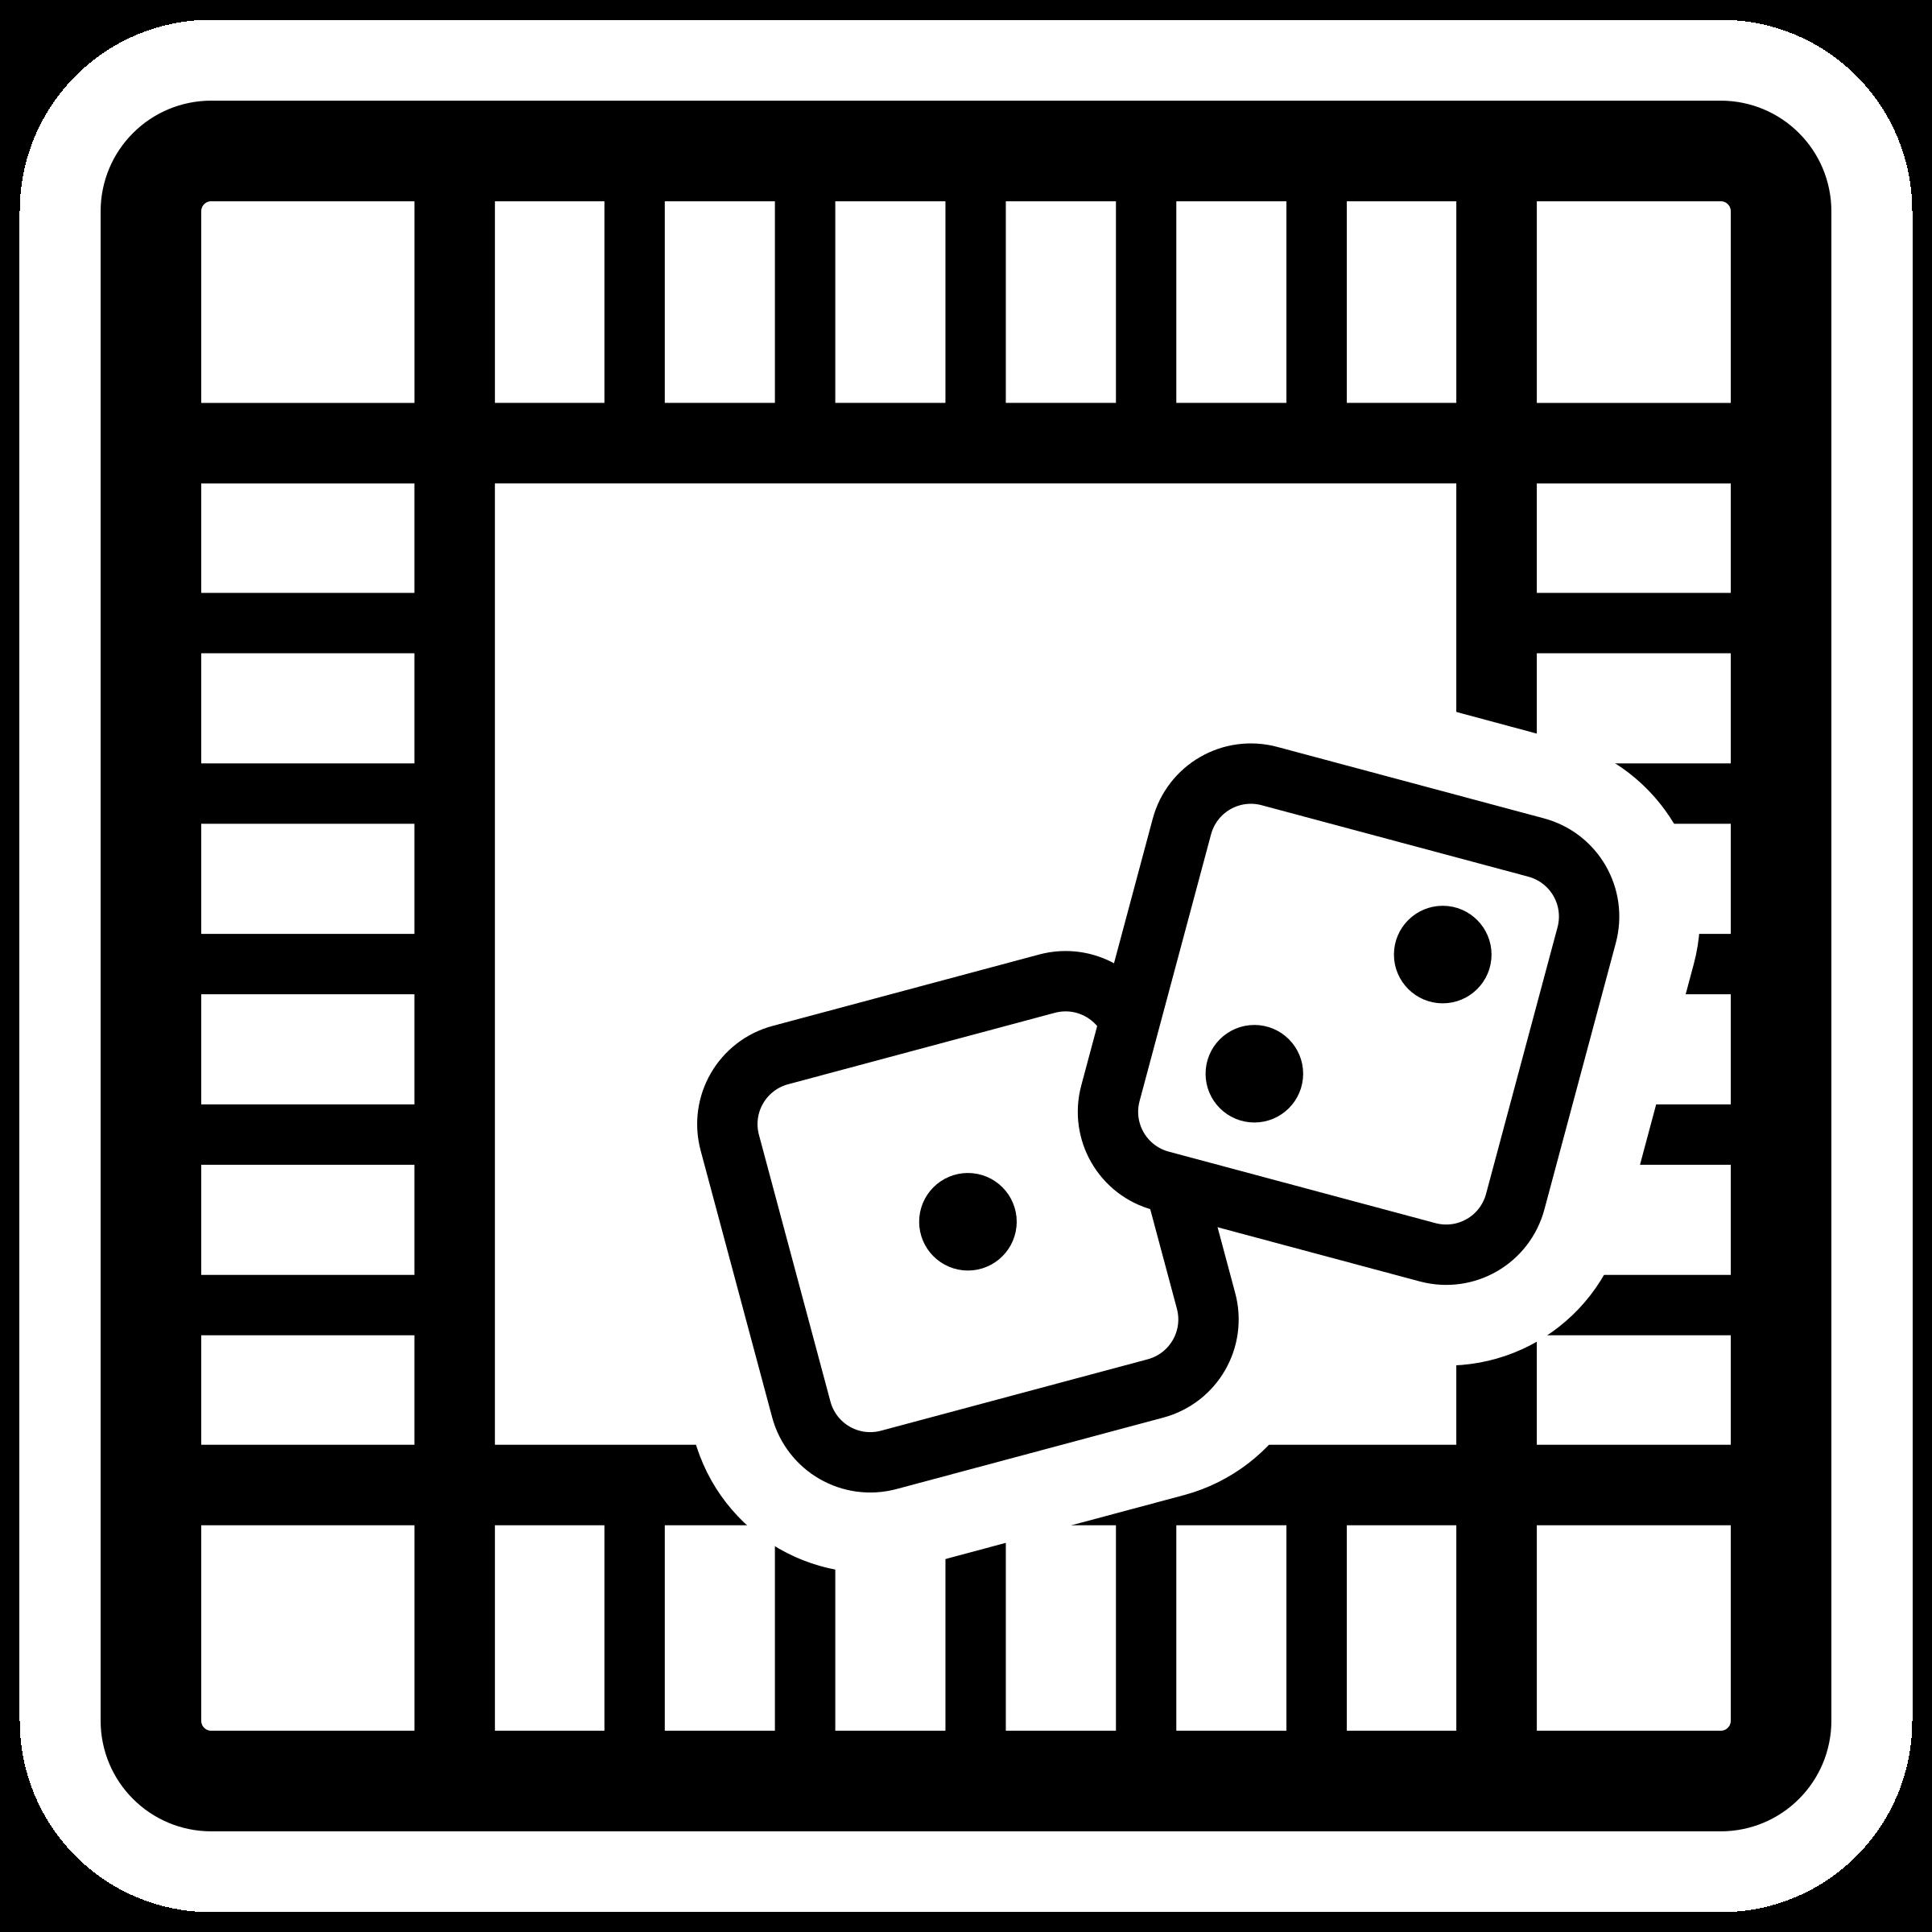 Free Black Games Cliparts, Download Free Clip Art, Free Clip.